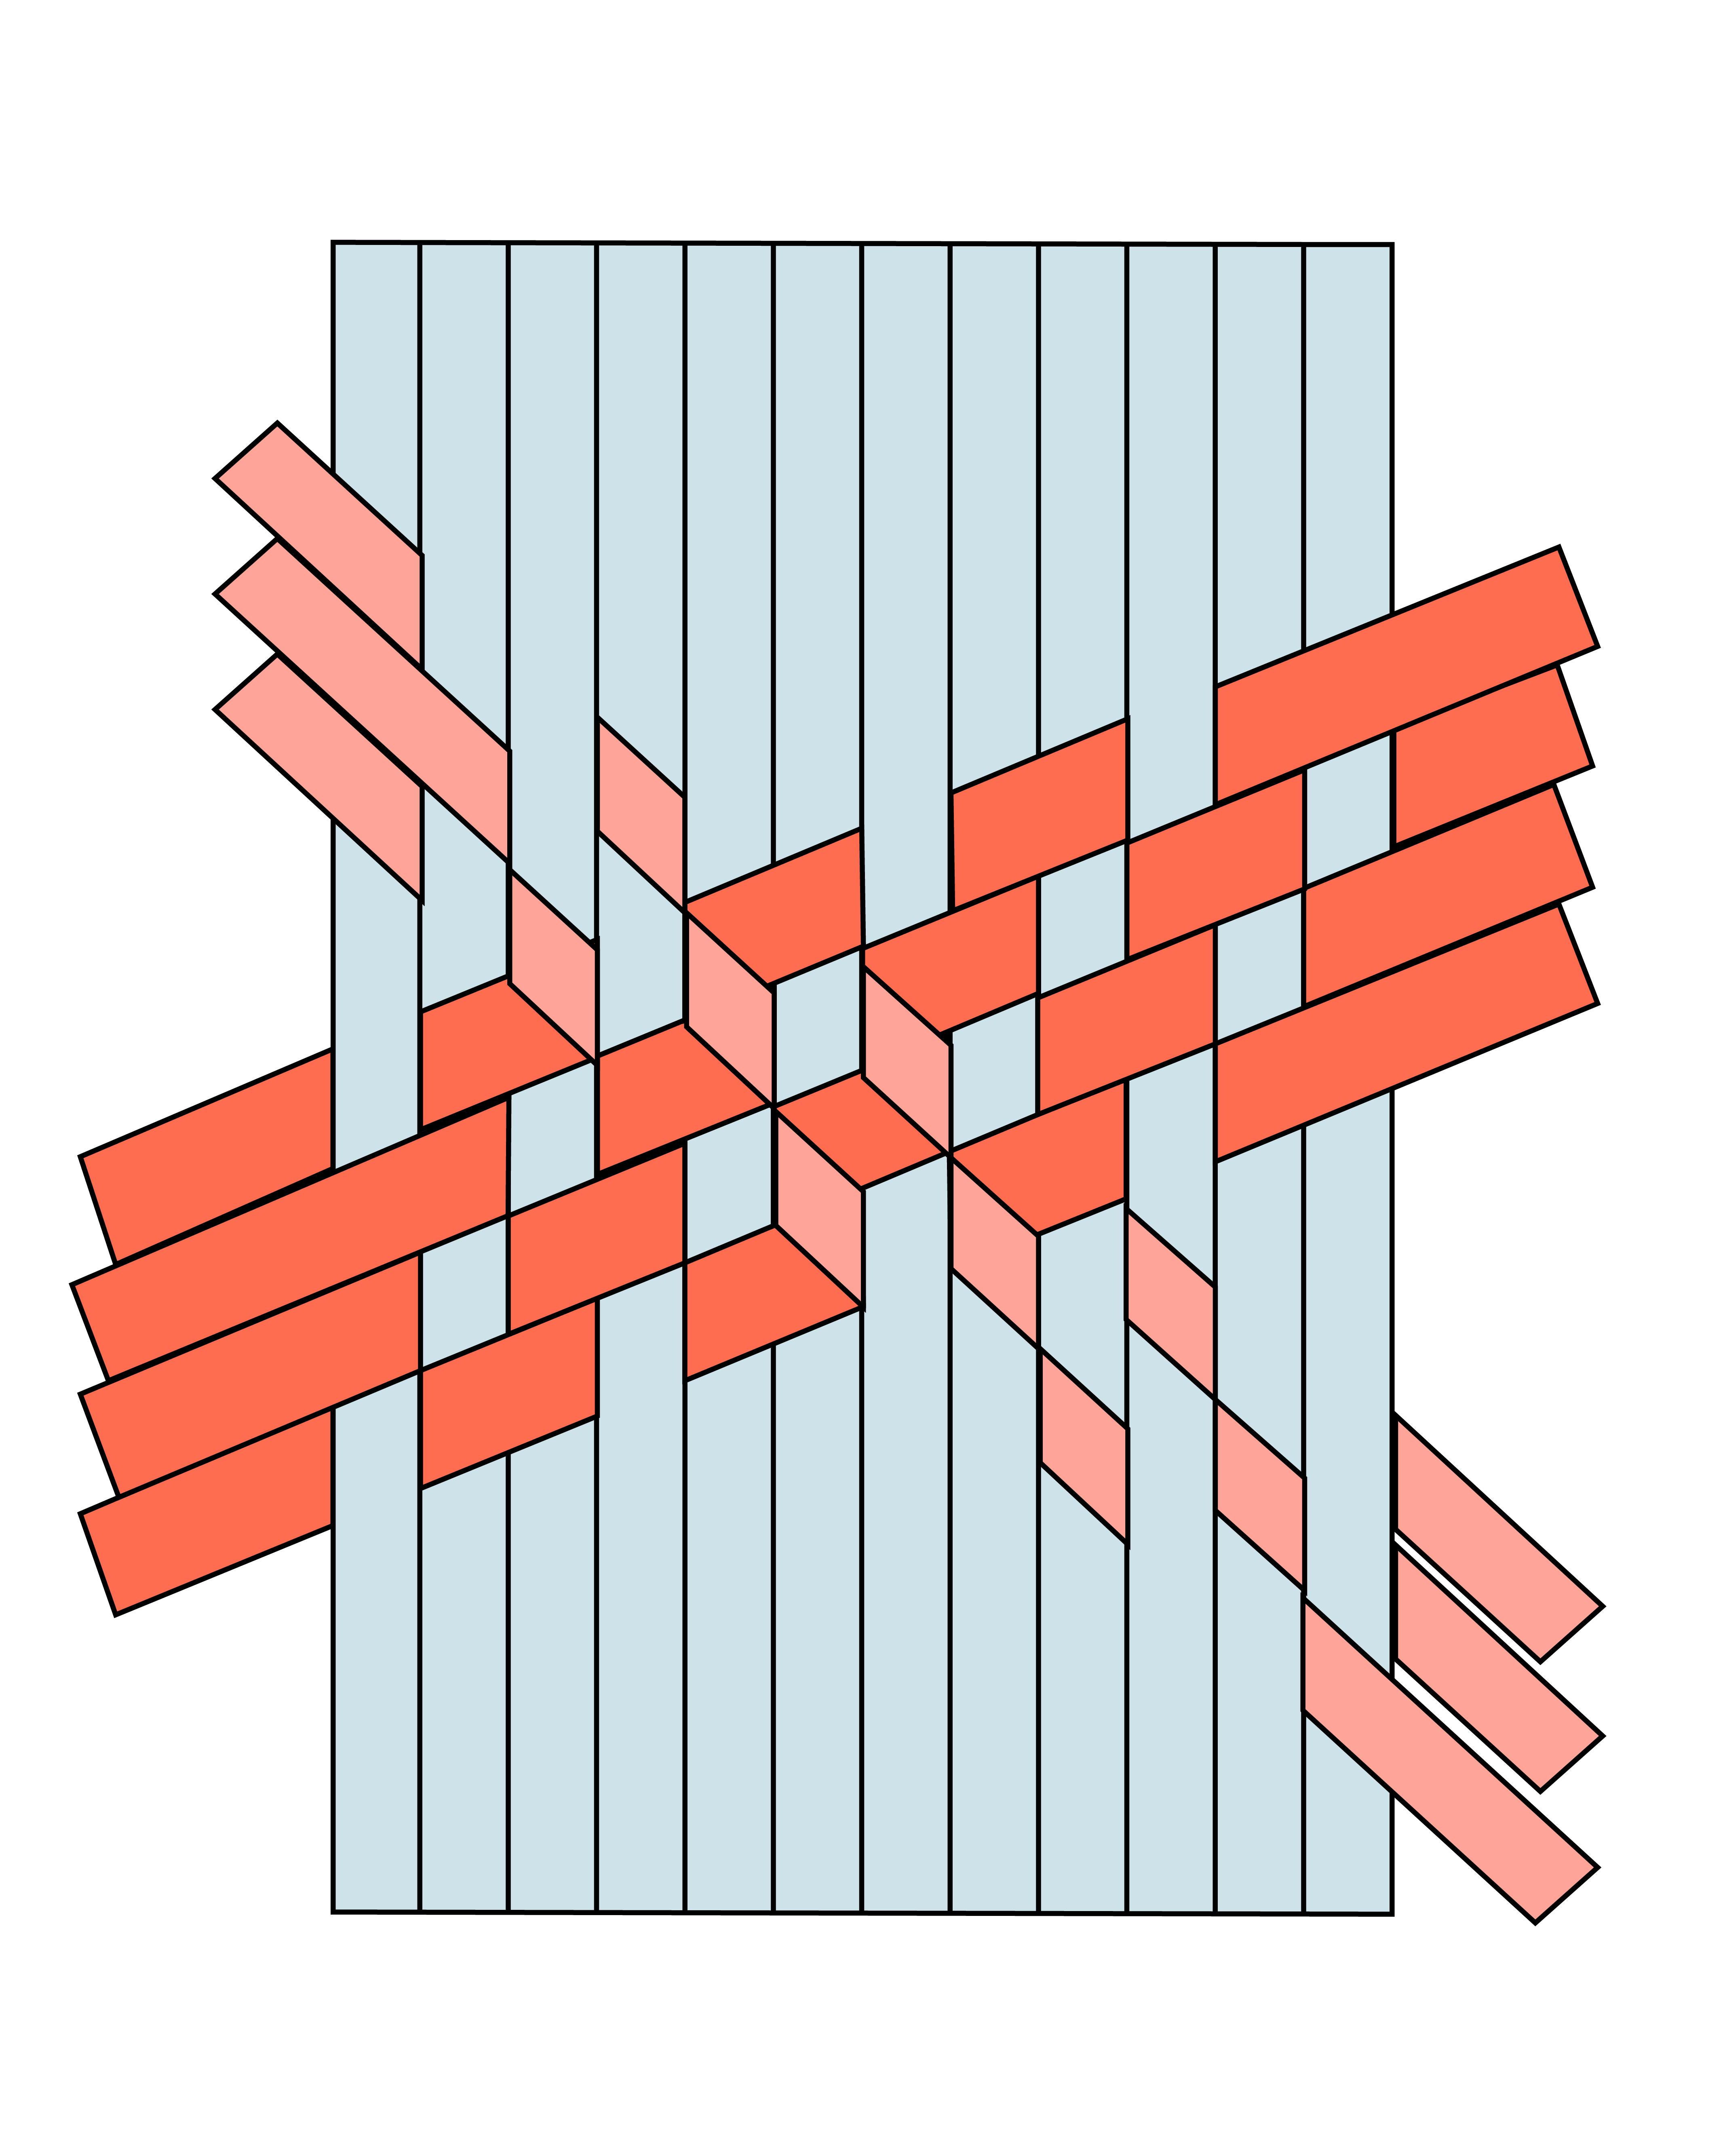 Tumbling Block Bias Tape Weaving - The House That Lars Built